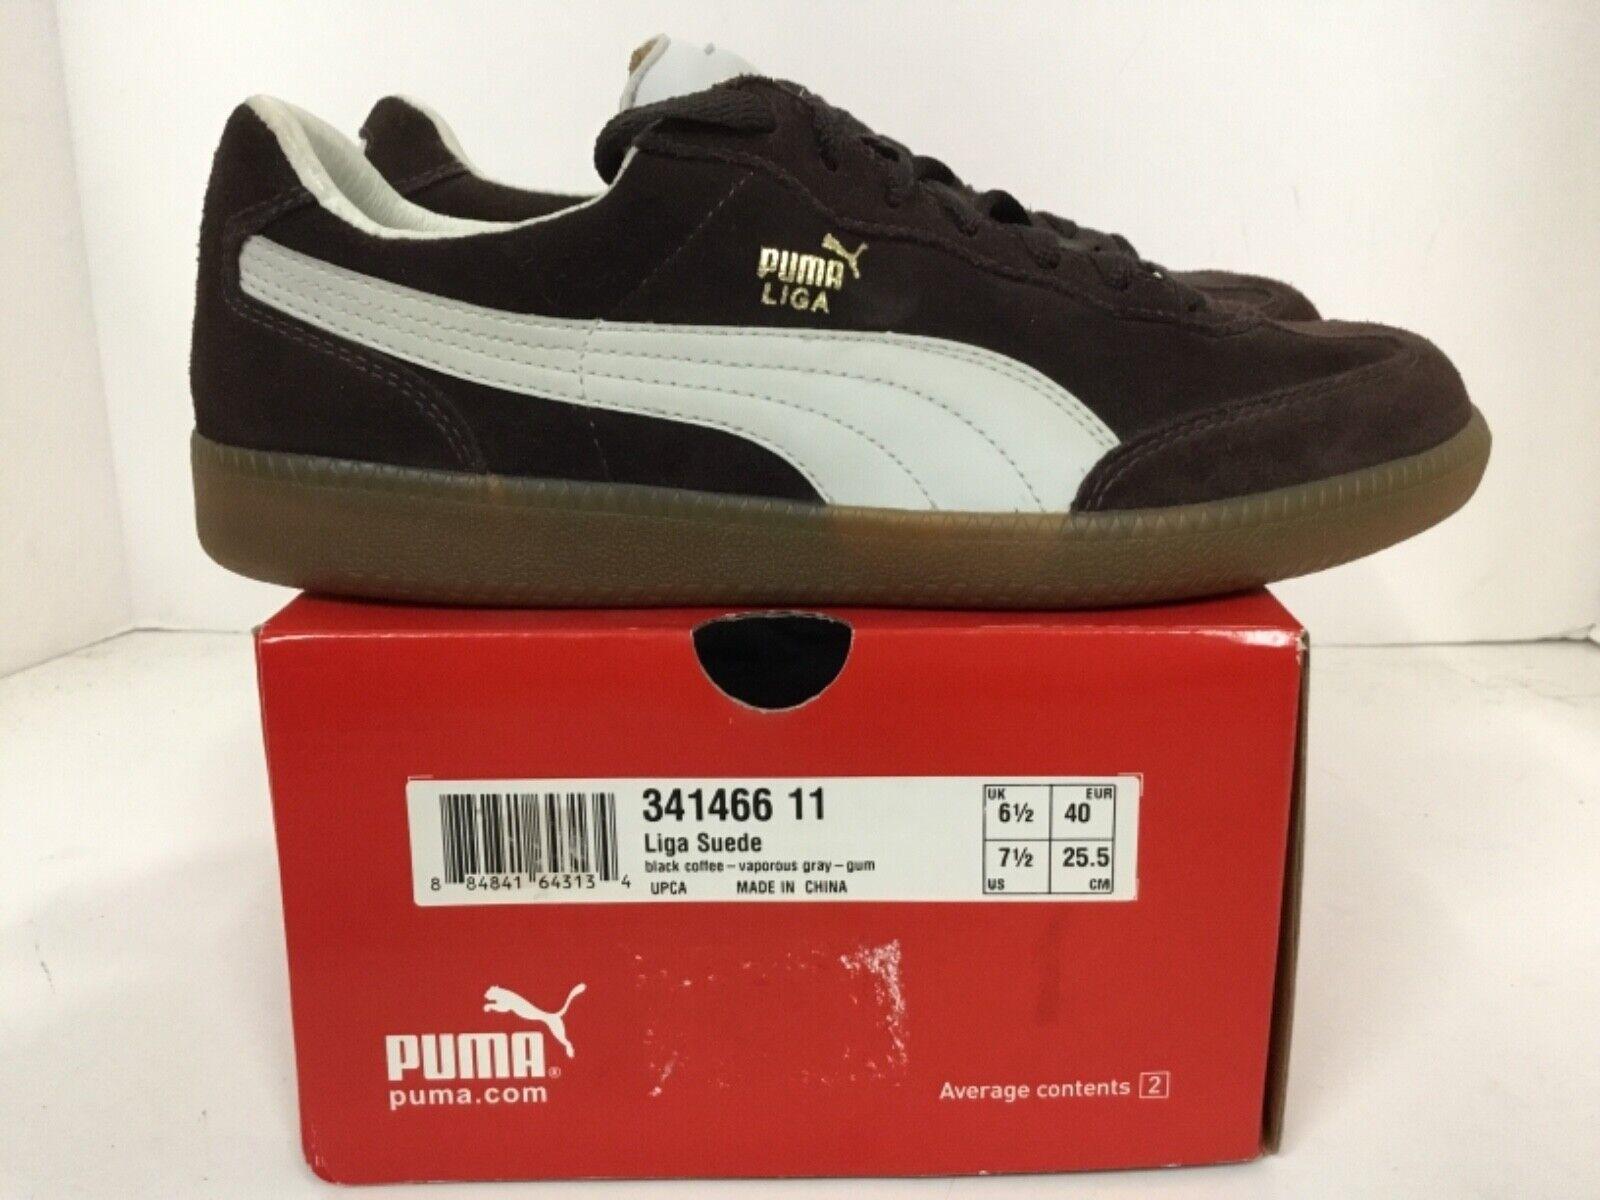 Puma Liga Suede Mens sneaker Style